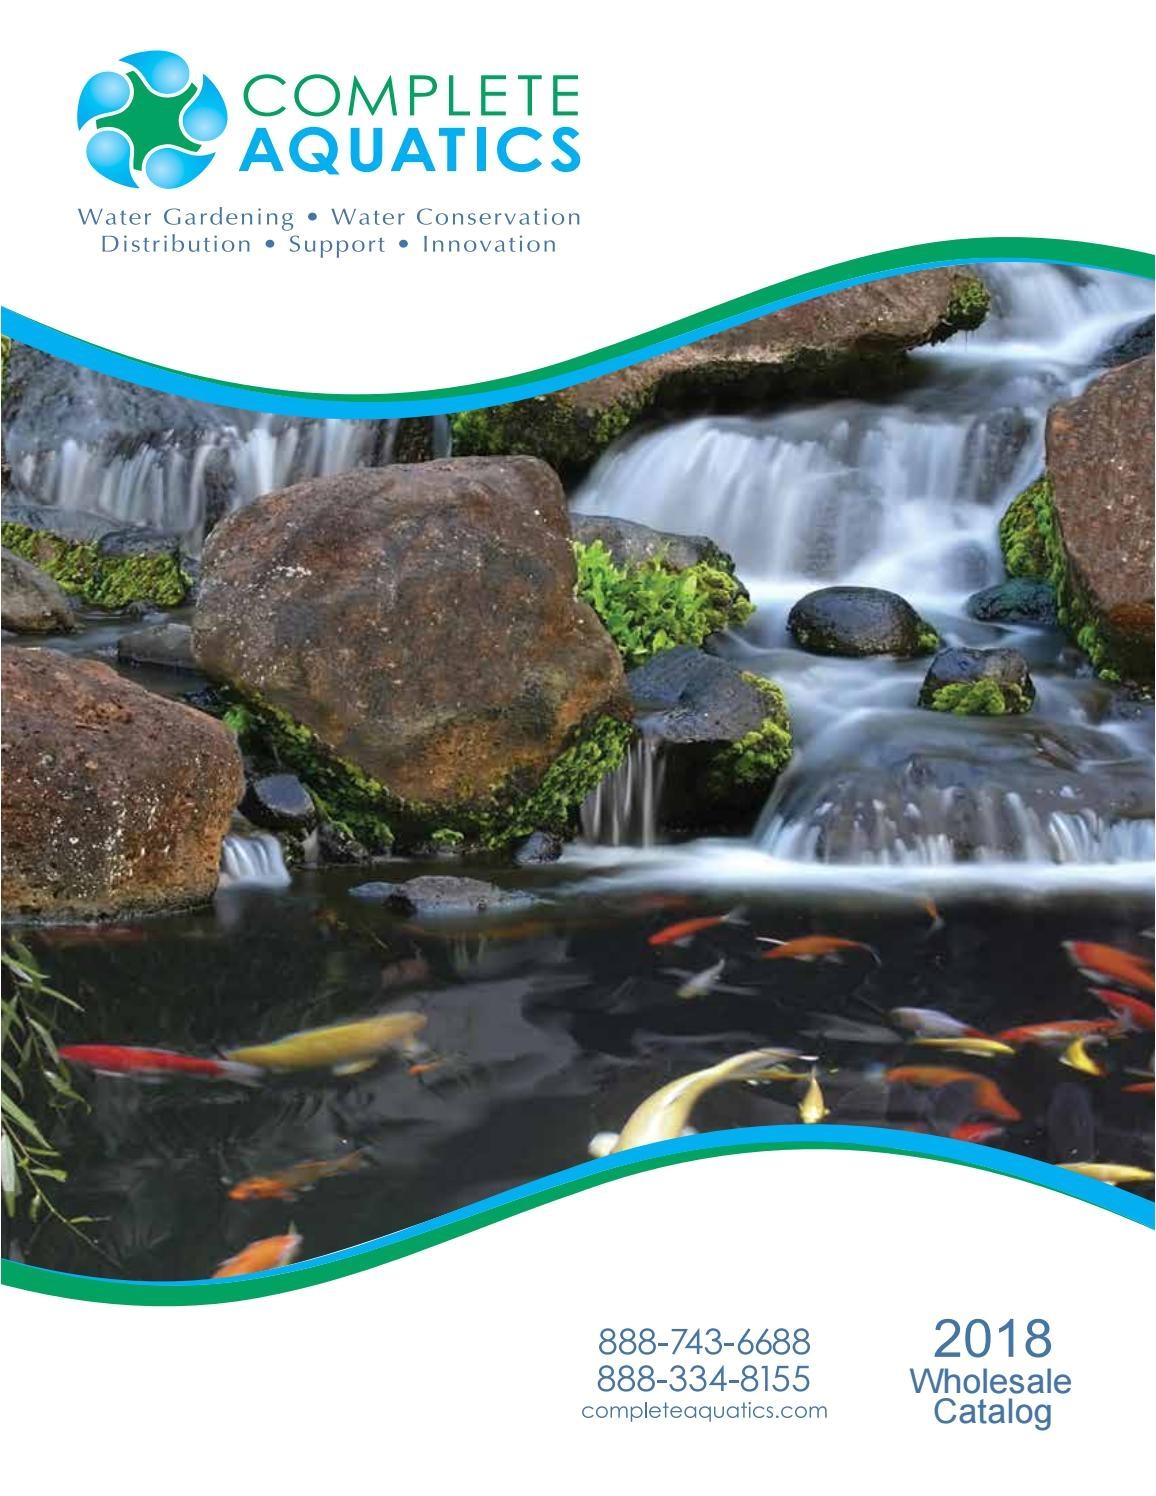 Marideck 8.5 Wide Marine Grade Vinyl Flooring- Seamless 80 Mil Complete Aquatics 2018 Catalog by Completeaquatics issuu